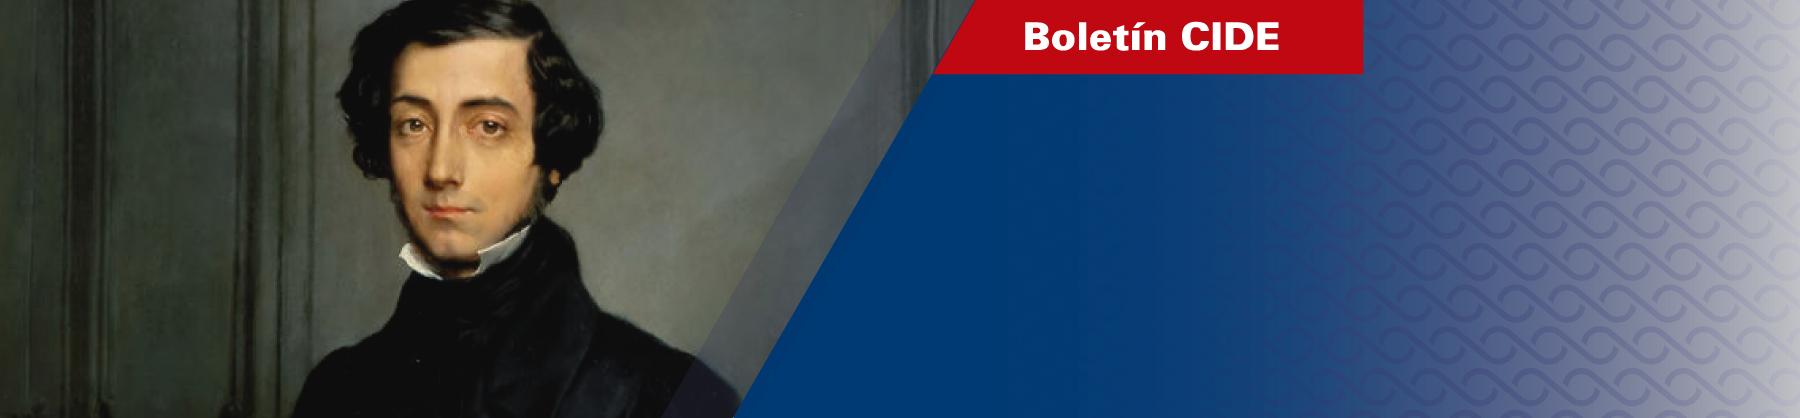 bannerboletin